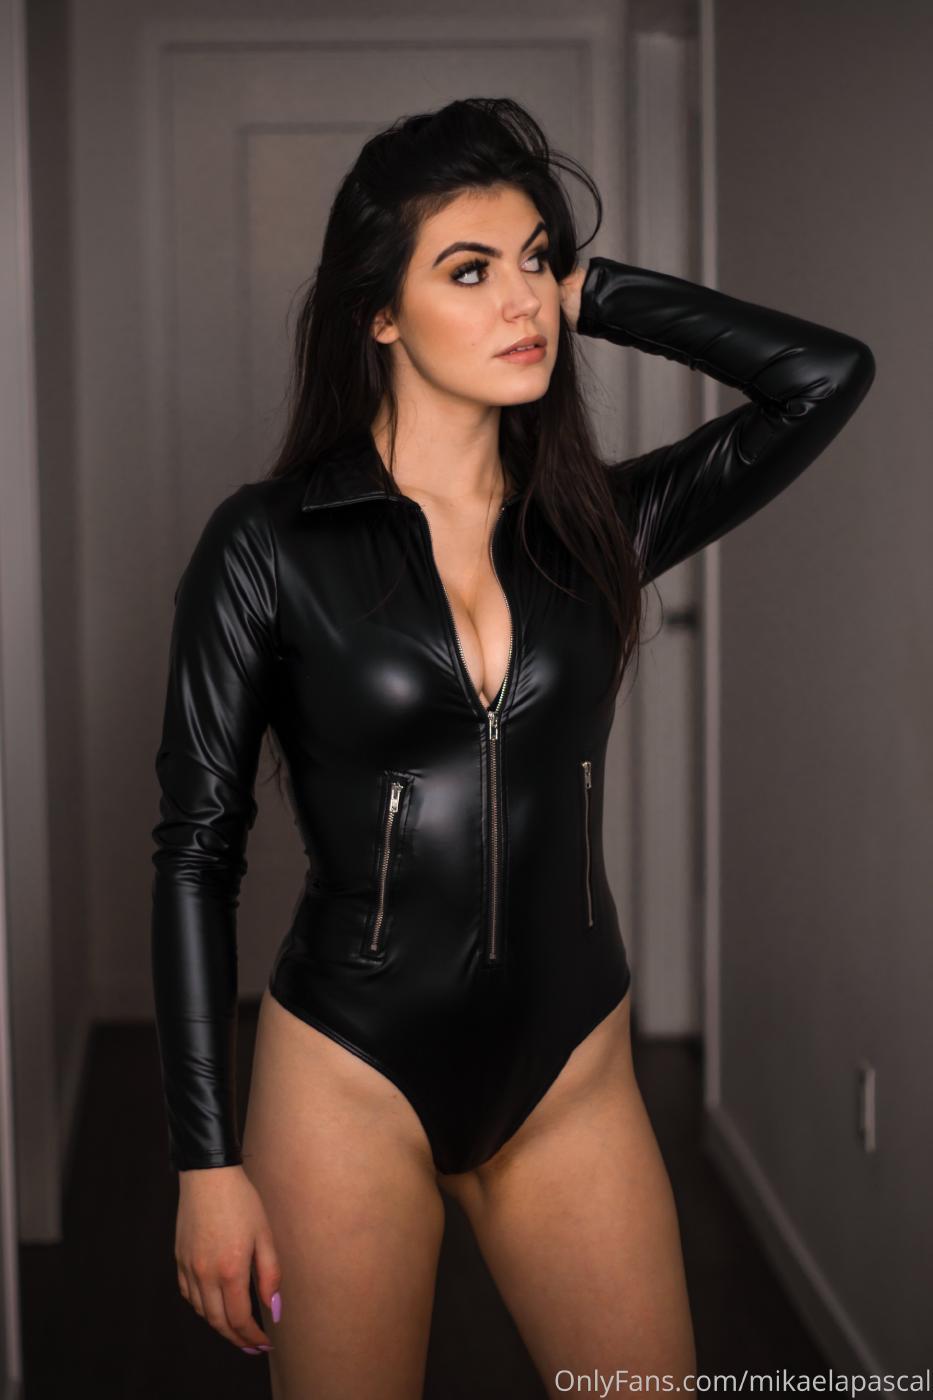 Mikaela Pascal Sexy Leather Bodysuit Onlyfans Set Leaked 0014